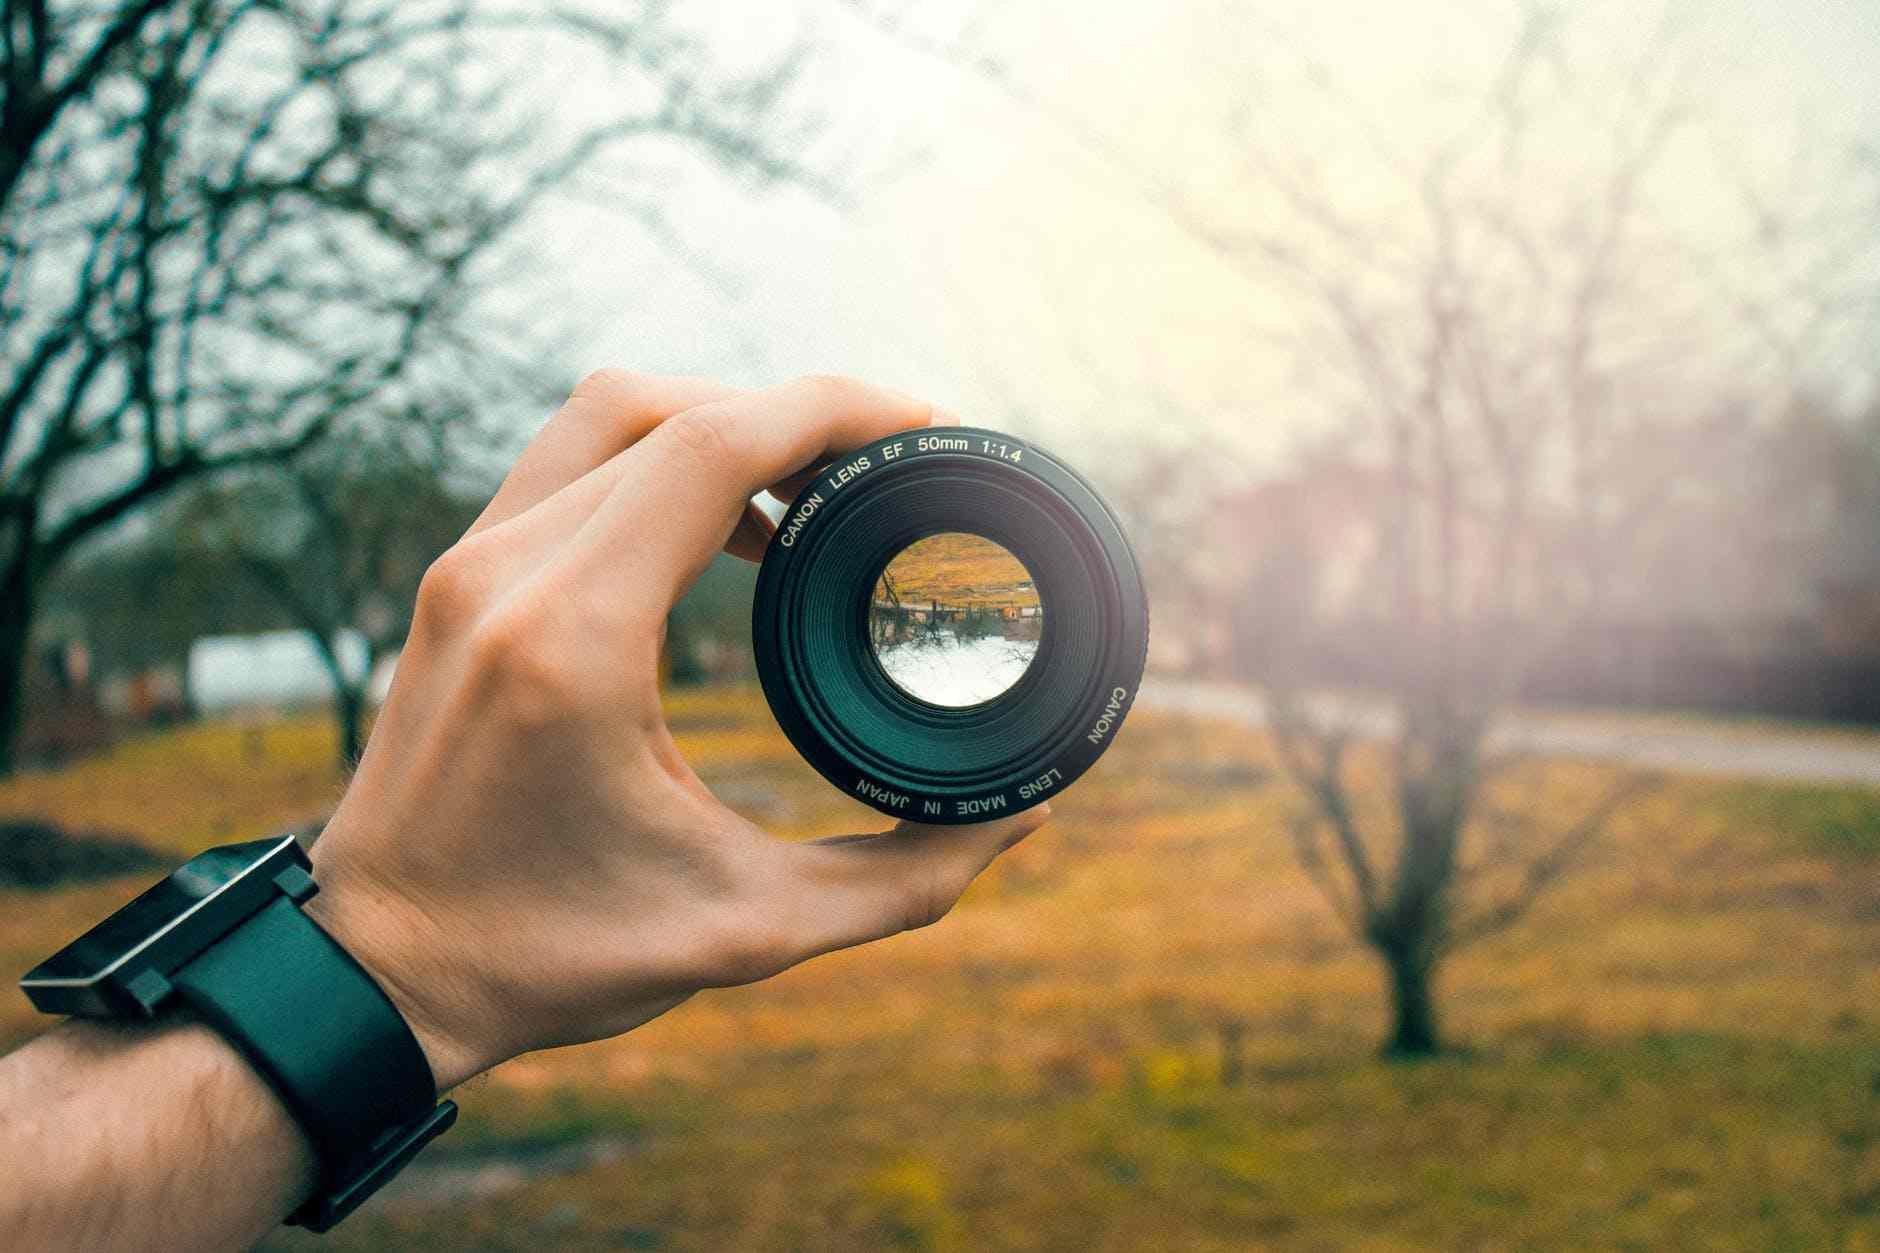 Contoh Penggunaan Mode Auto Fokus dan Manual Fokus